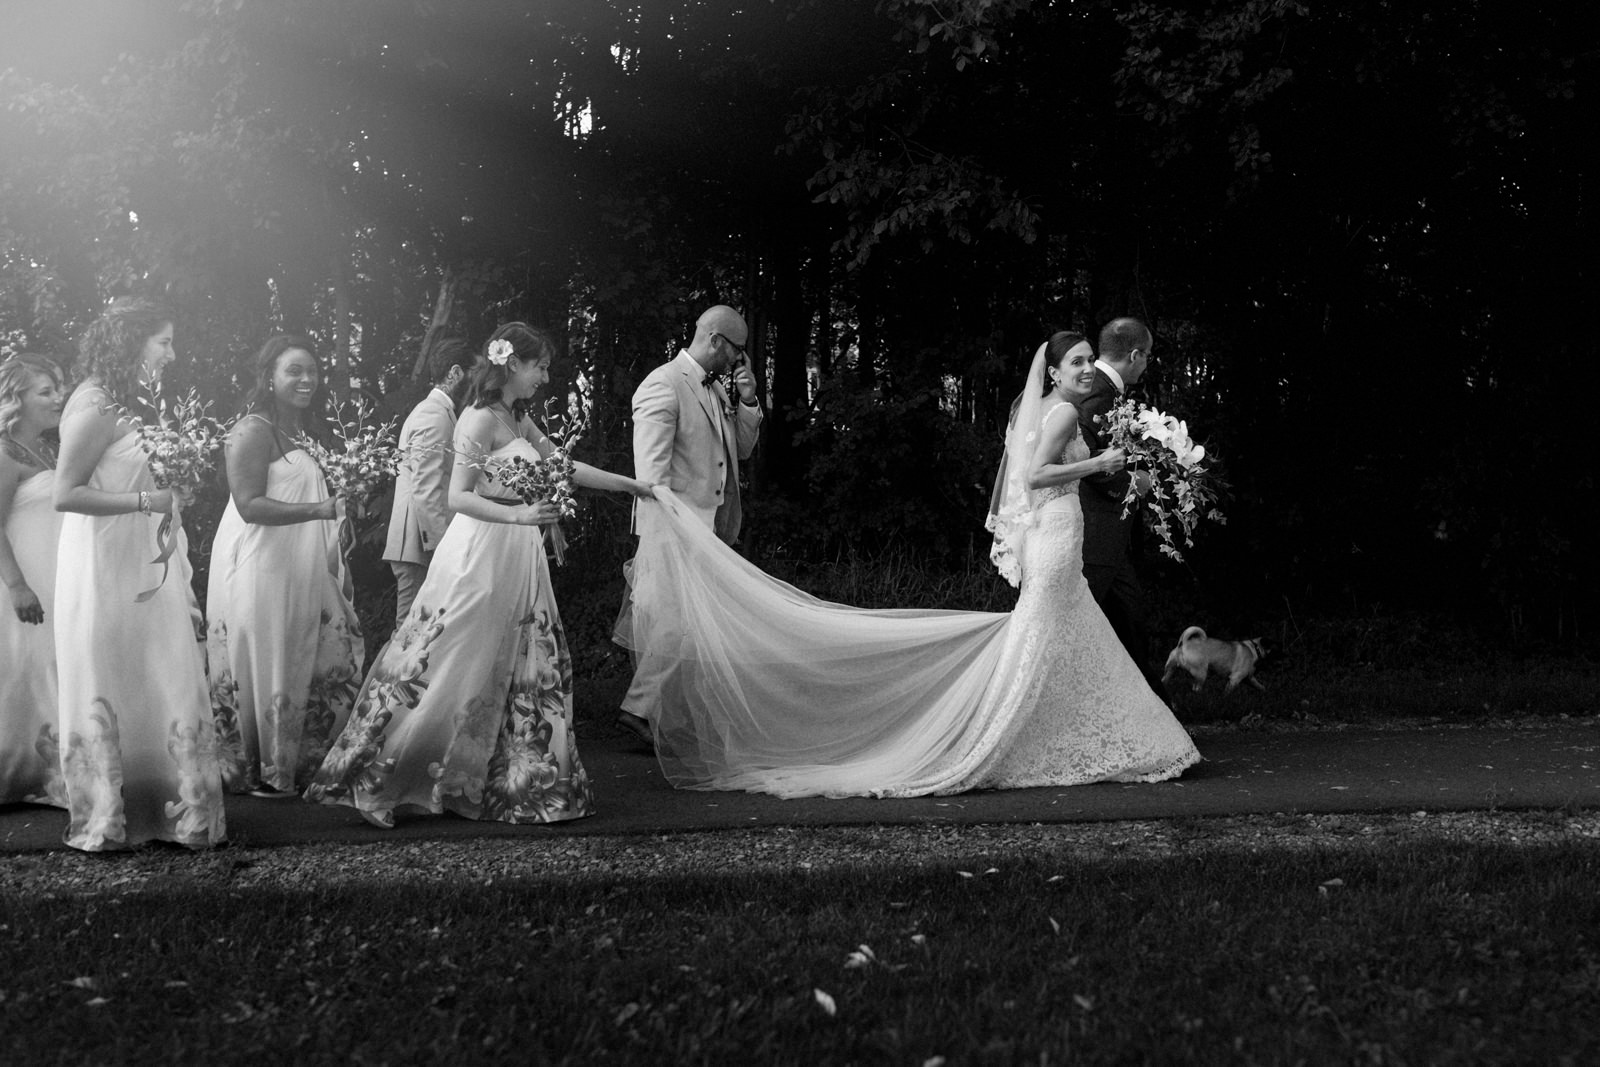 Galia Lahav wedding dress from White Montreal, at Fritz Farm wedding.jpg